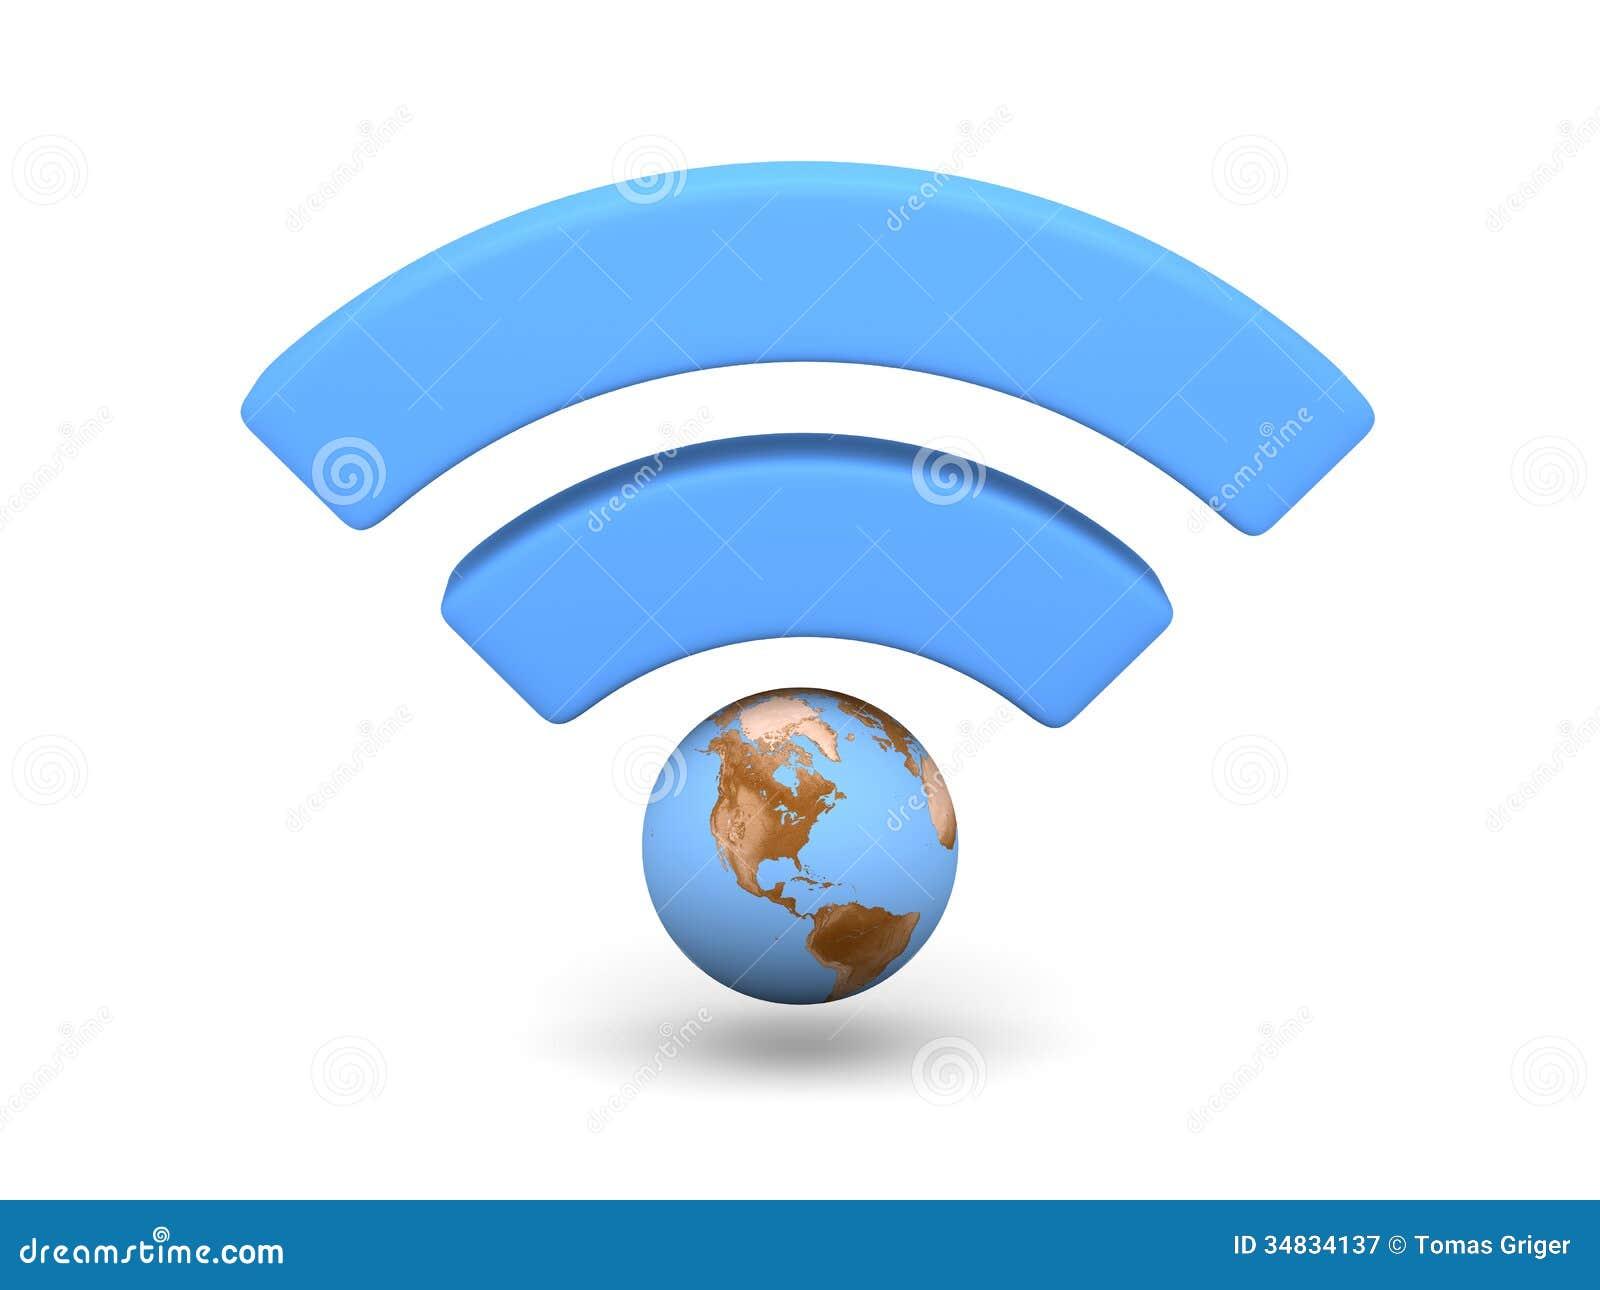 Unlimited Wifi Hotspot >> Blue WiFi symbol stock illustration. Illustration of wifi - 34834137